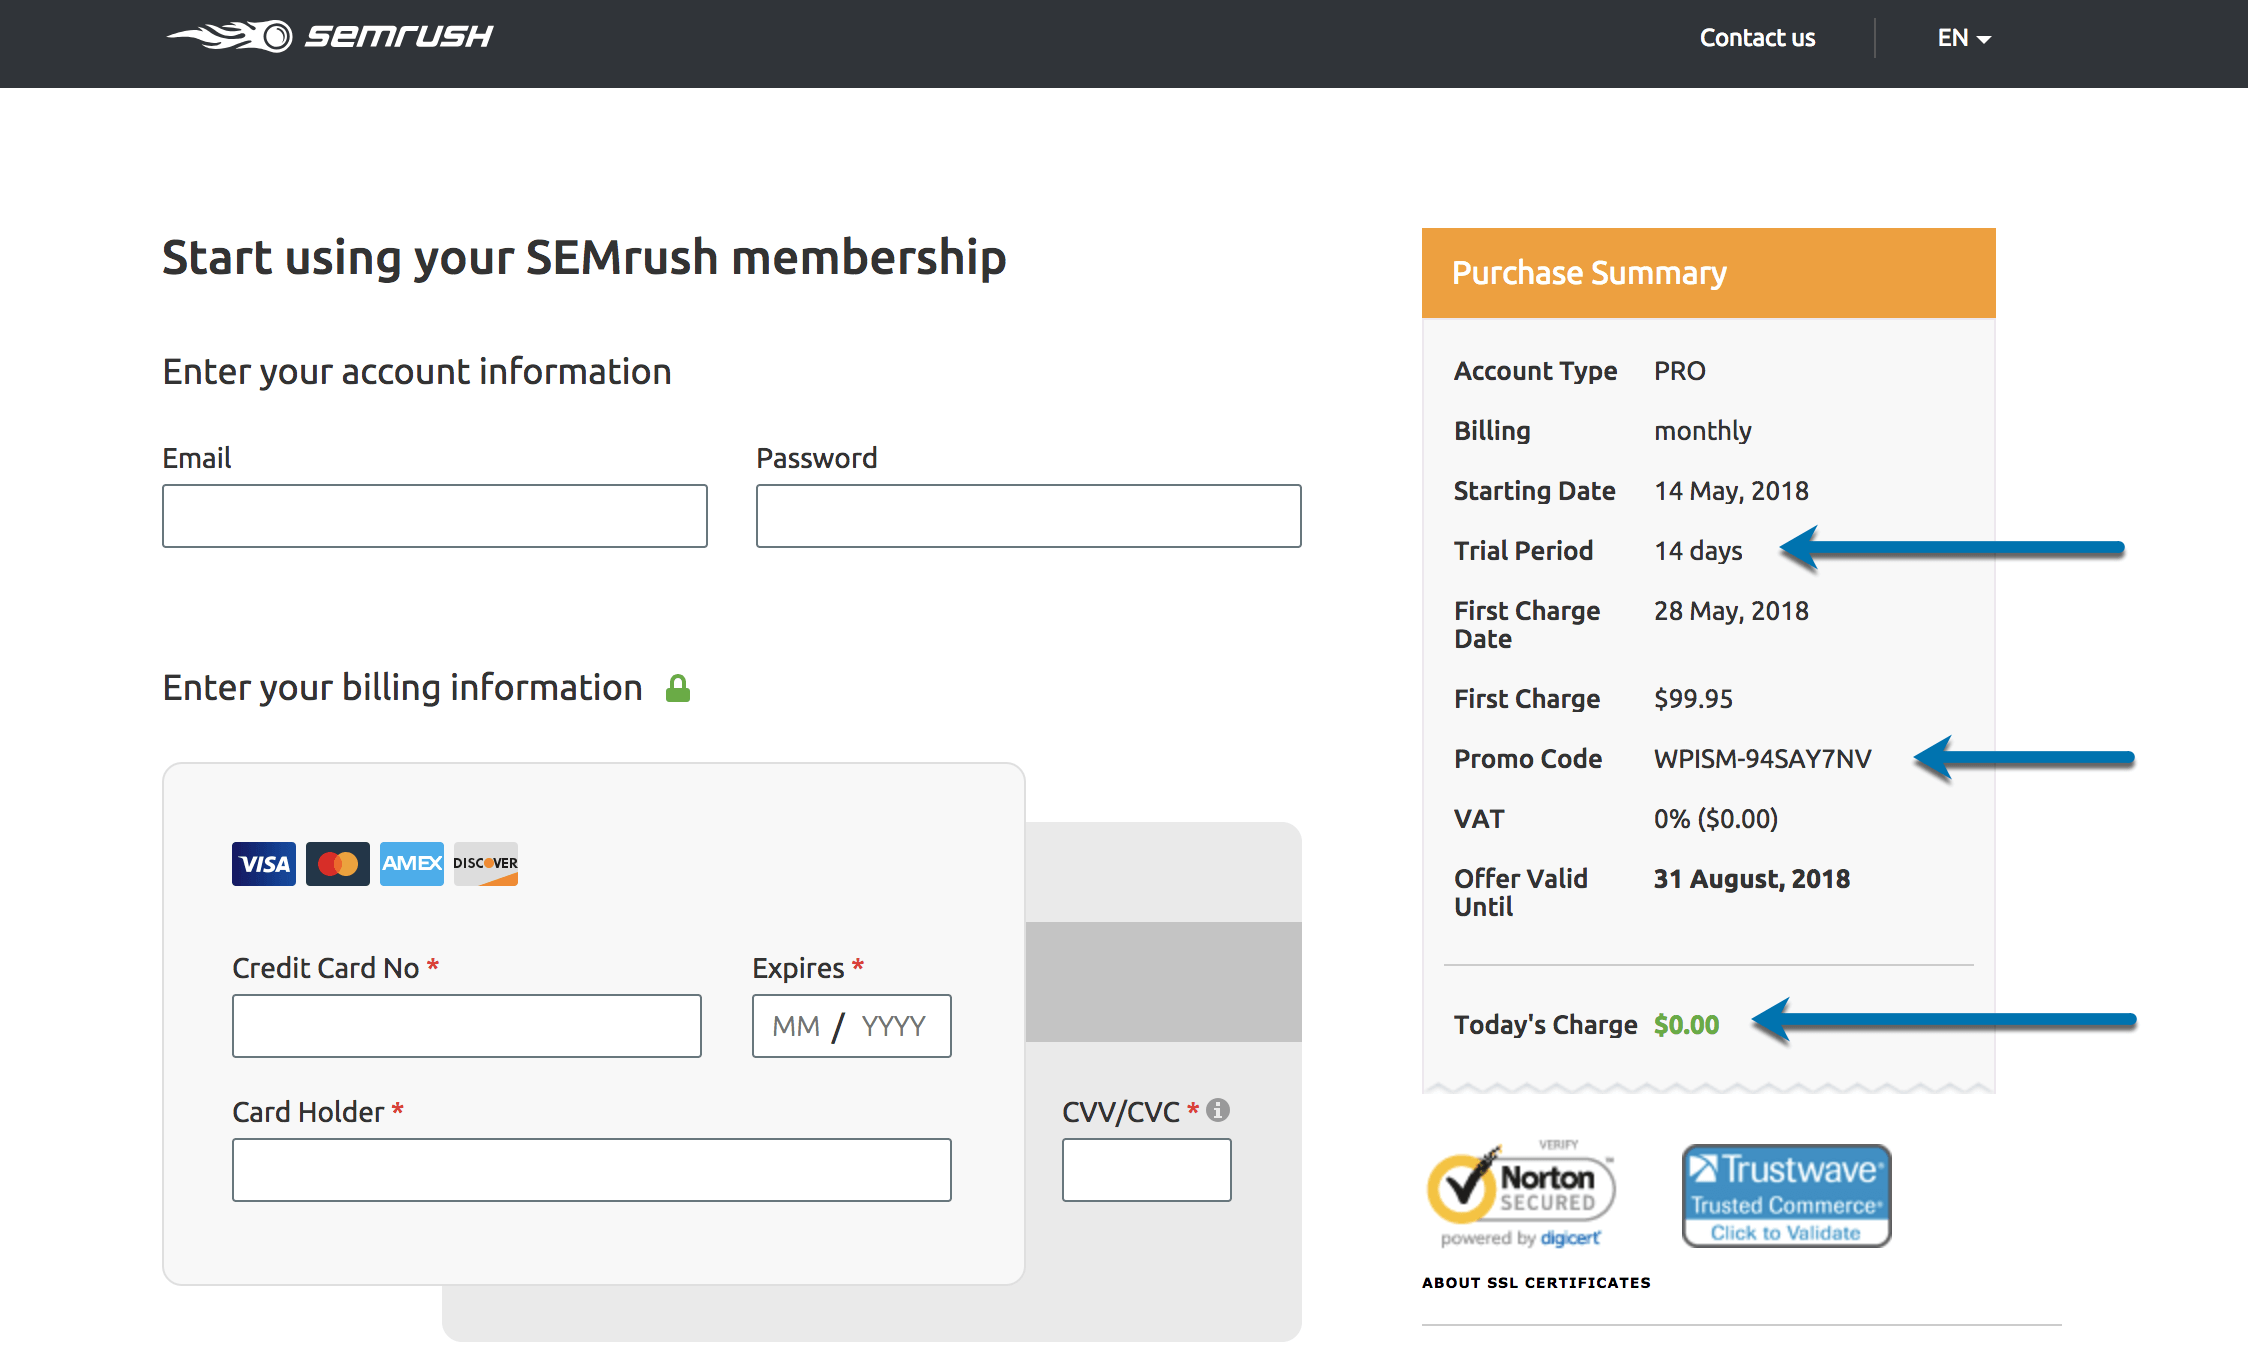 SEMrush coupon code 2018 discount